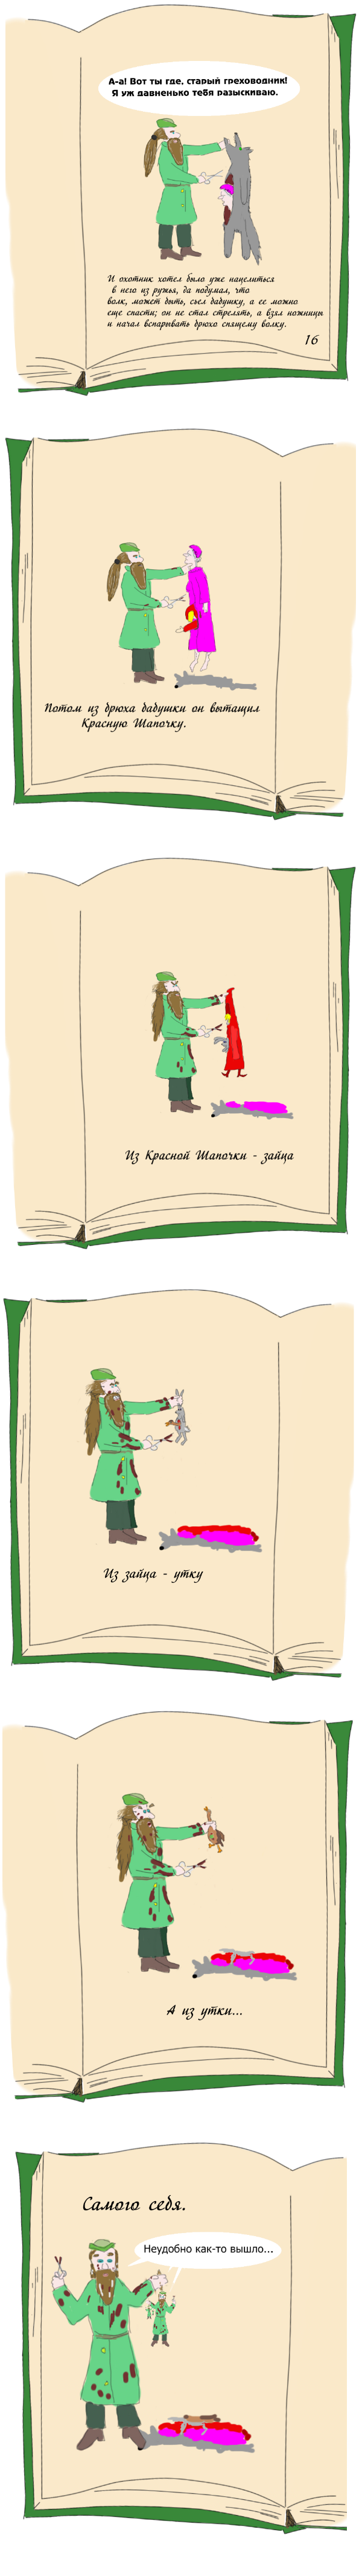 Комикс битва №16 выпуск 63